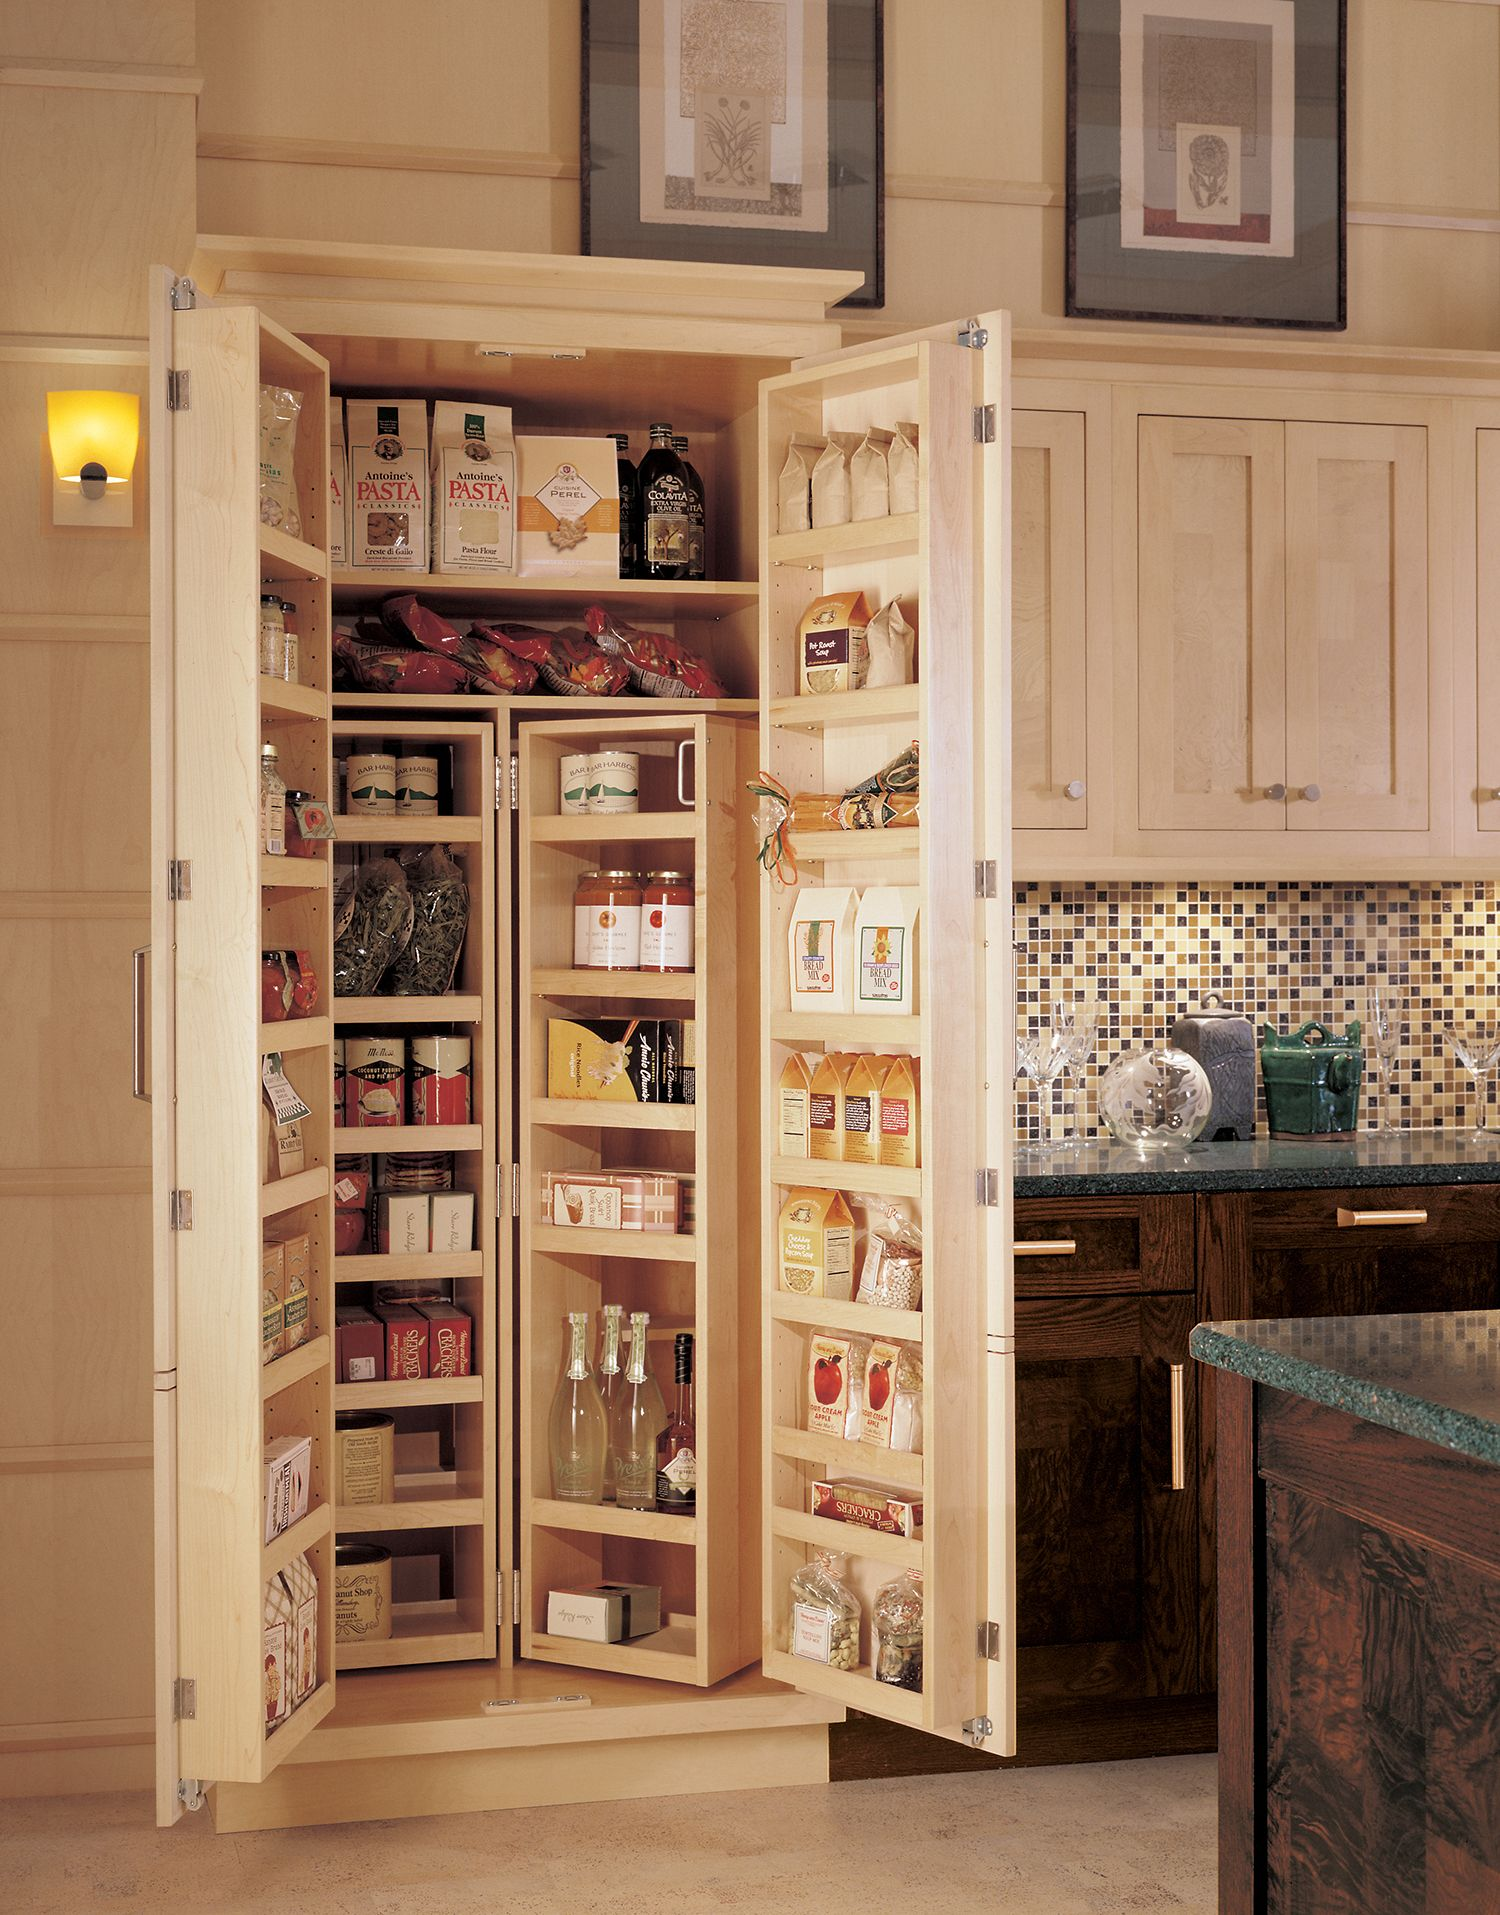 Chef S Pantry Kitchen Furniture Storage Kitchen Remodel Layout Kitchen Remodel Cost